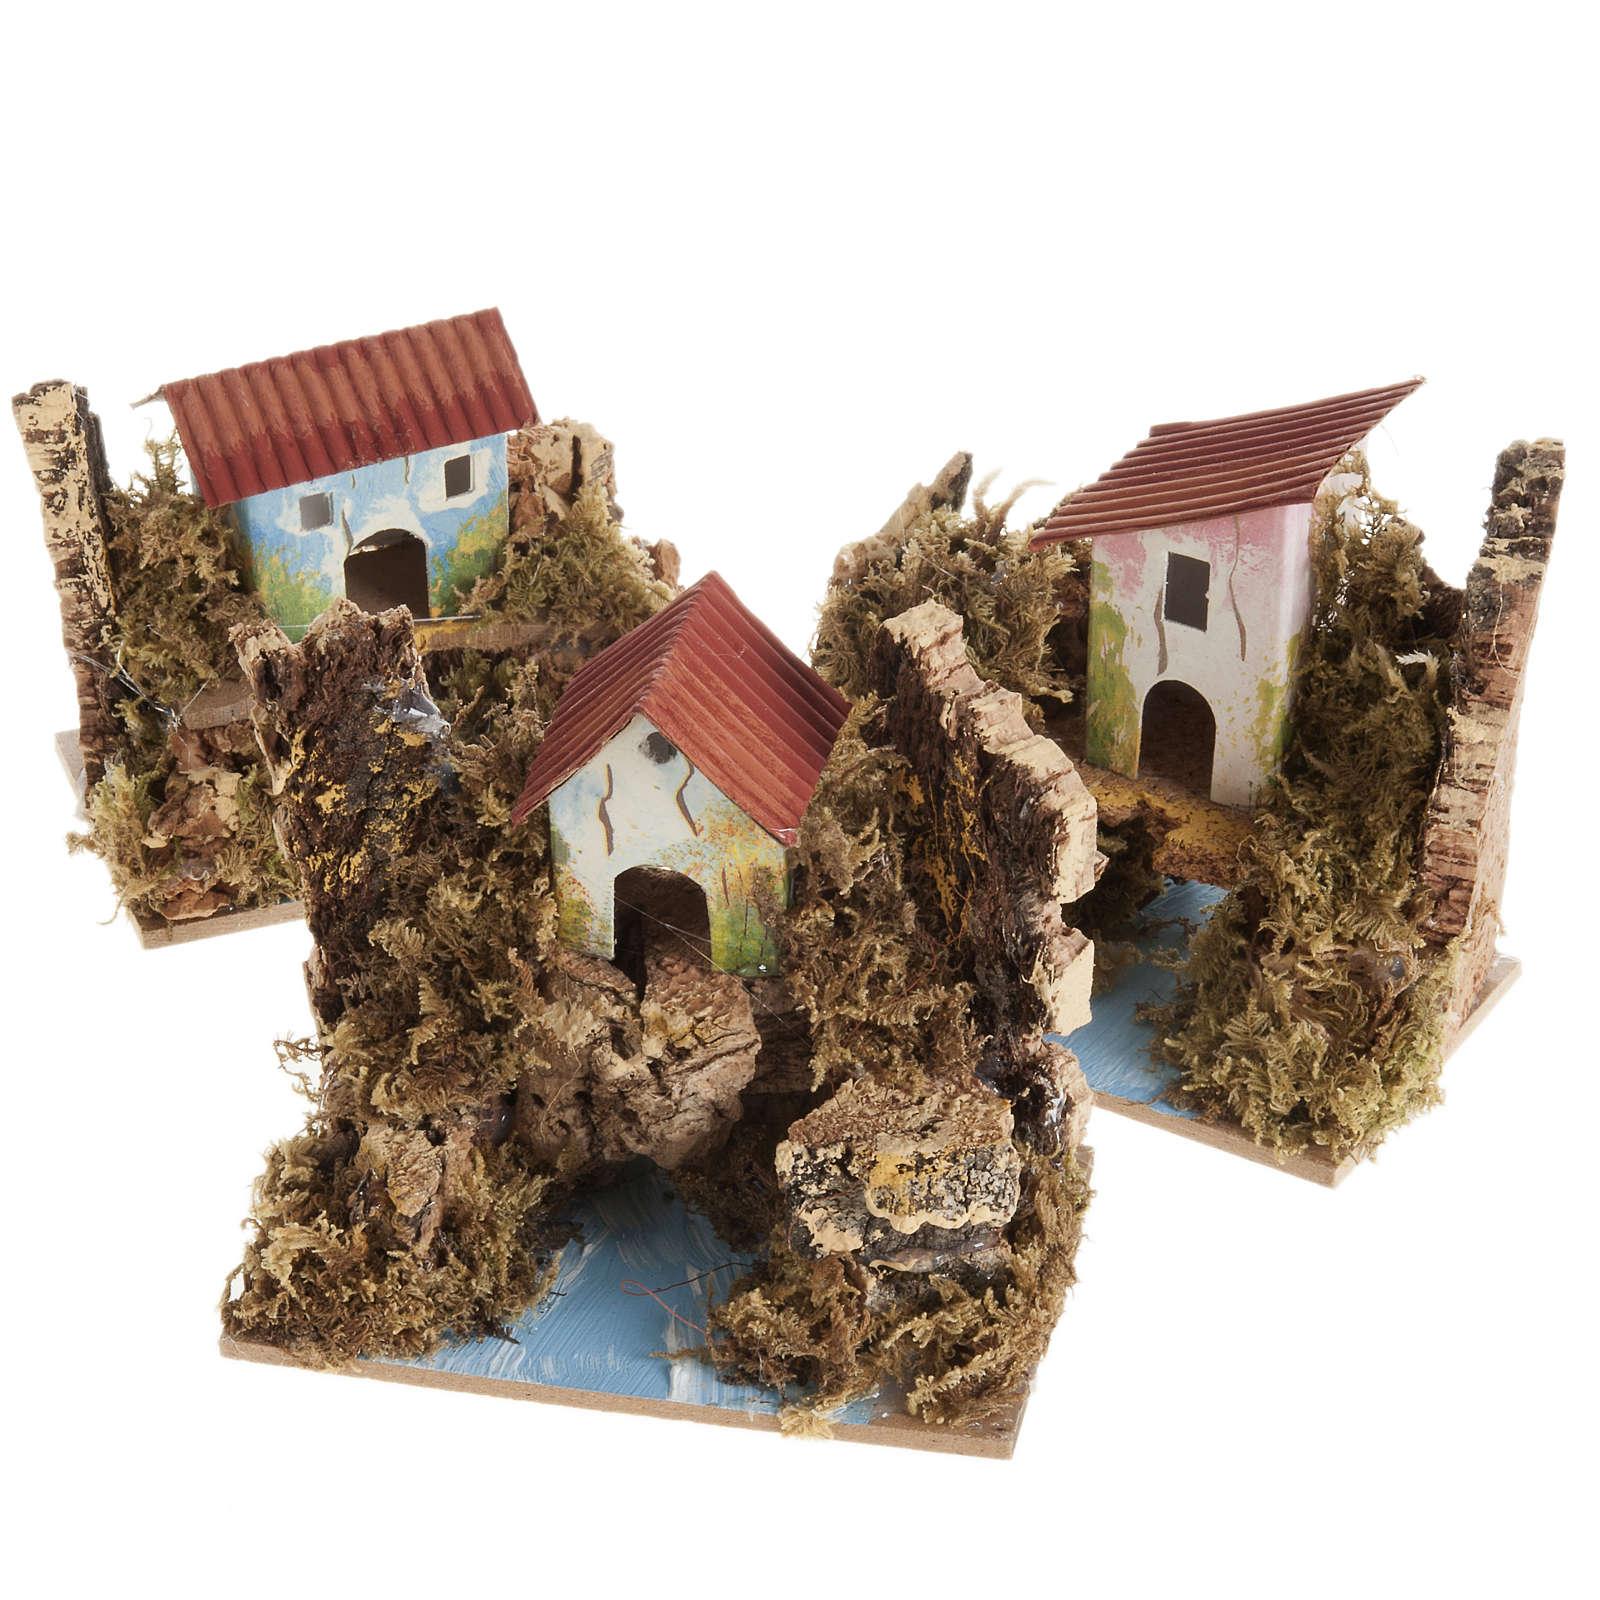 Casetta presepe legno su fiume assortite 4